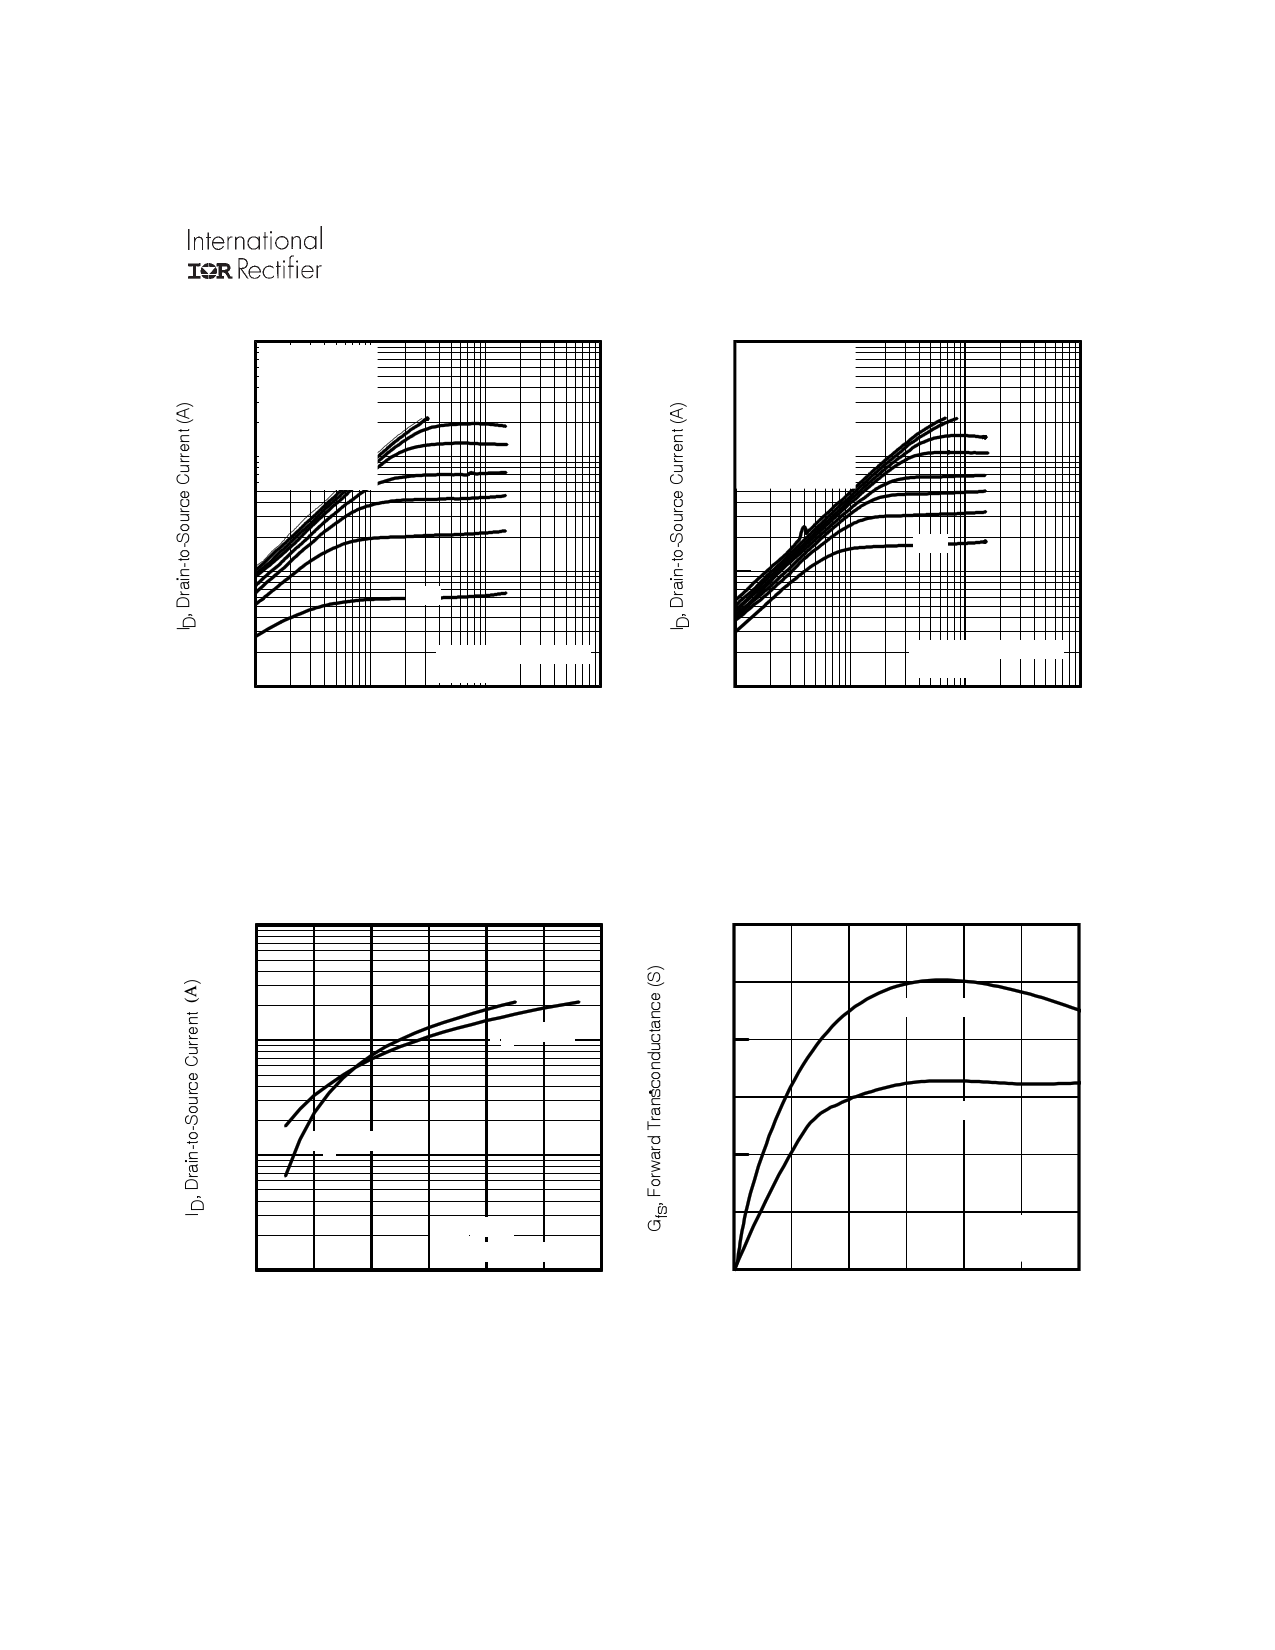 IRFZ46ZPbF pdf, ピン配列